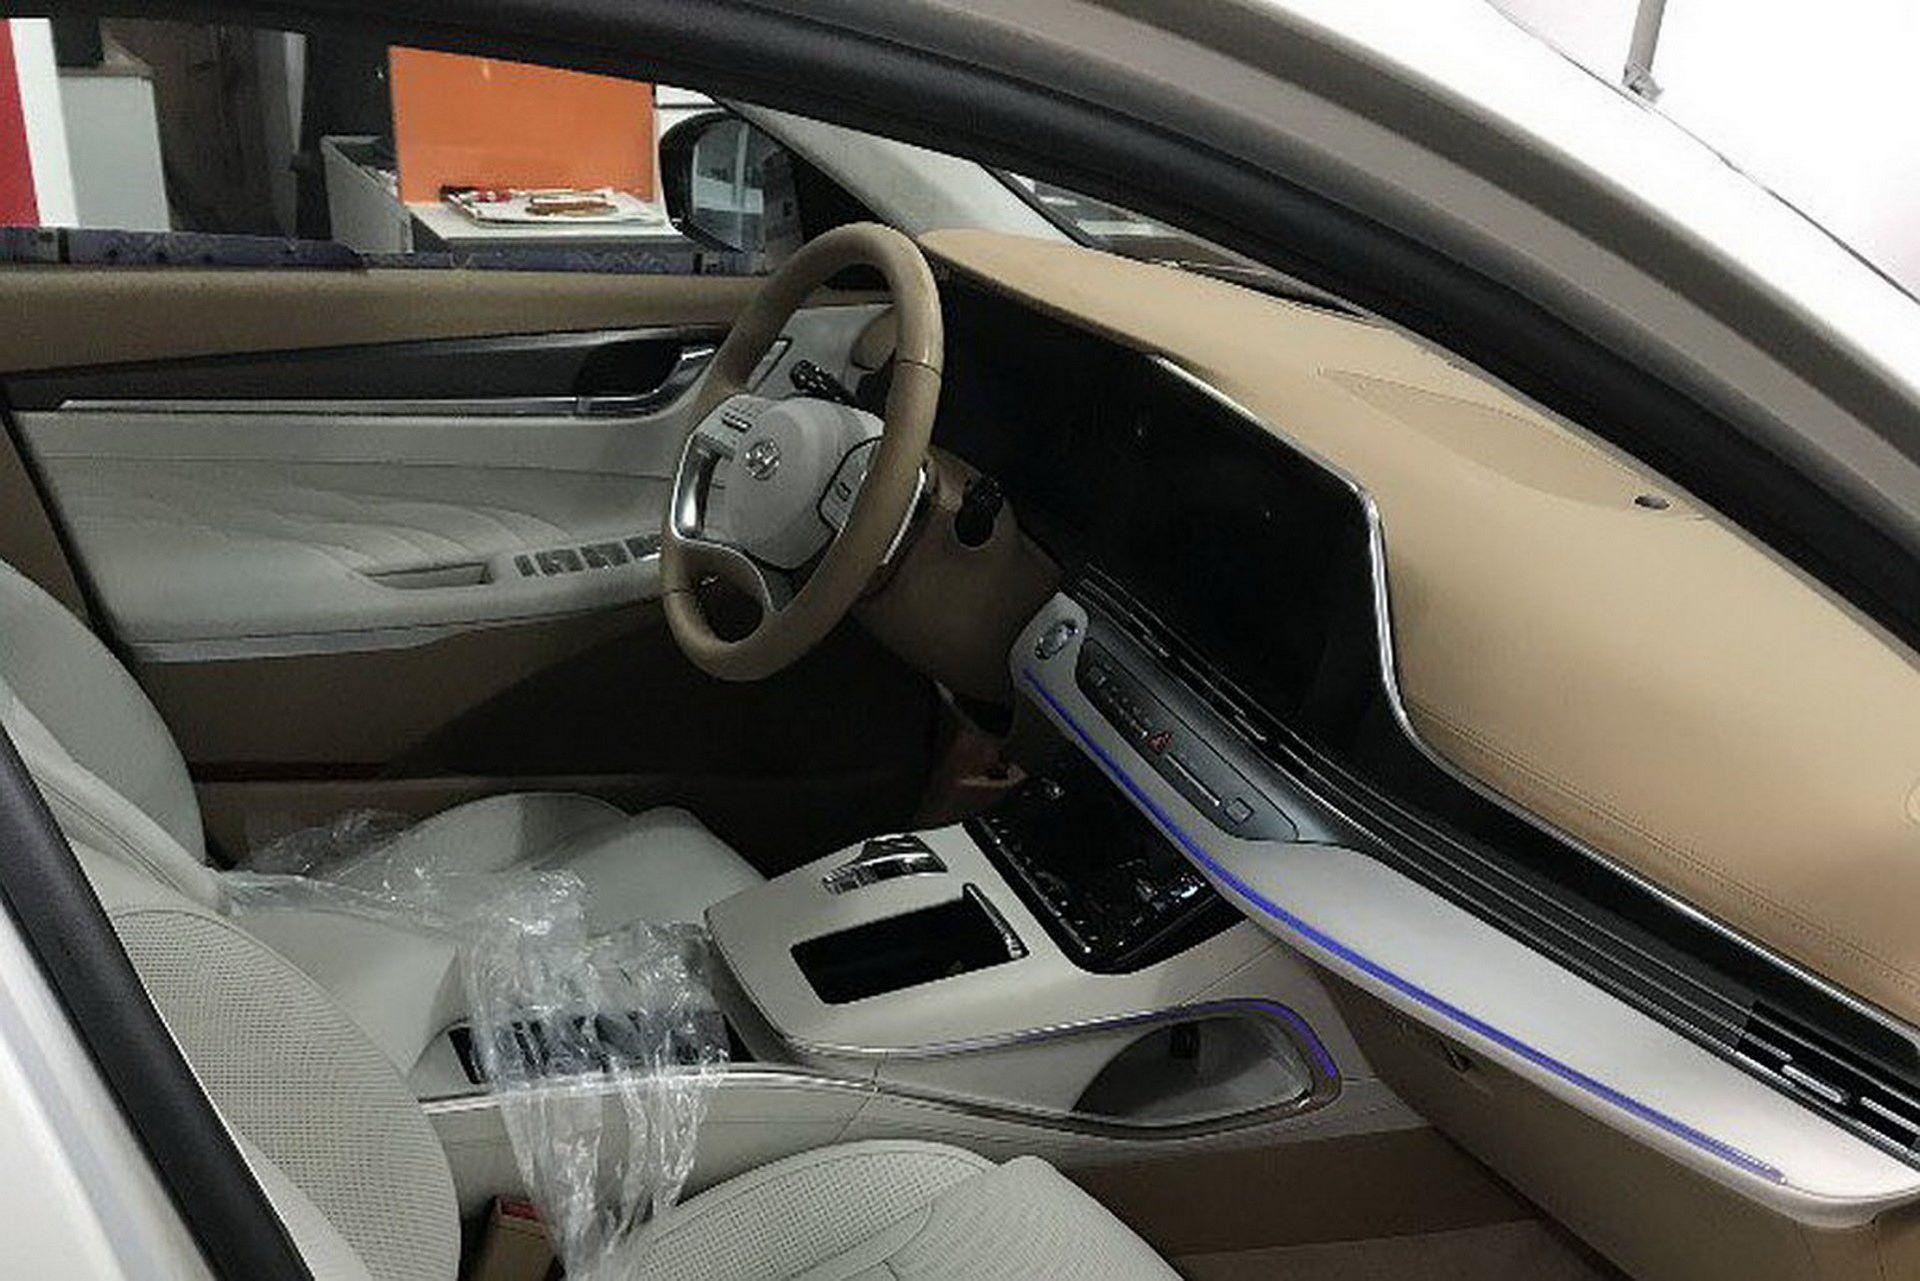 Hyundai-Grandeur-Azera-2020-leaked-photos-5